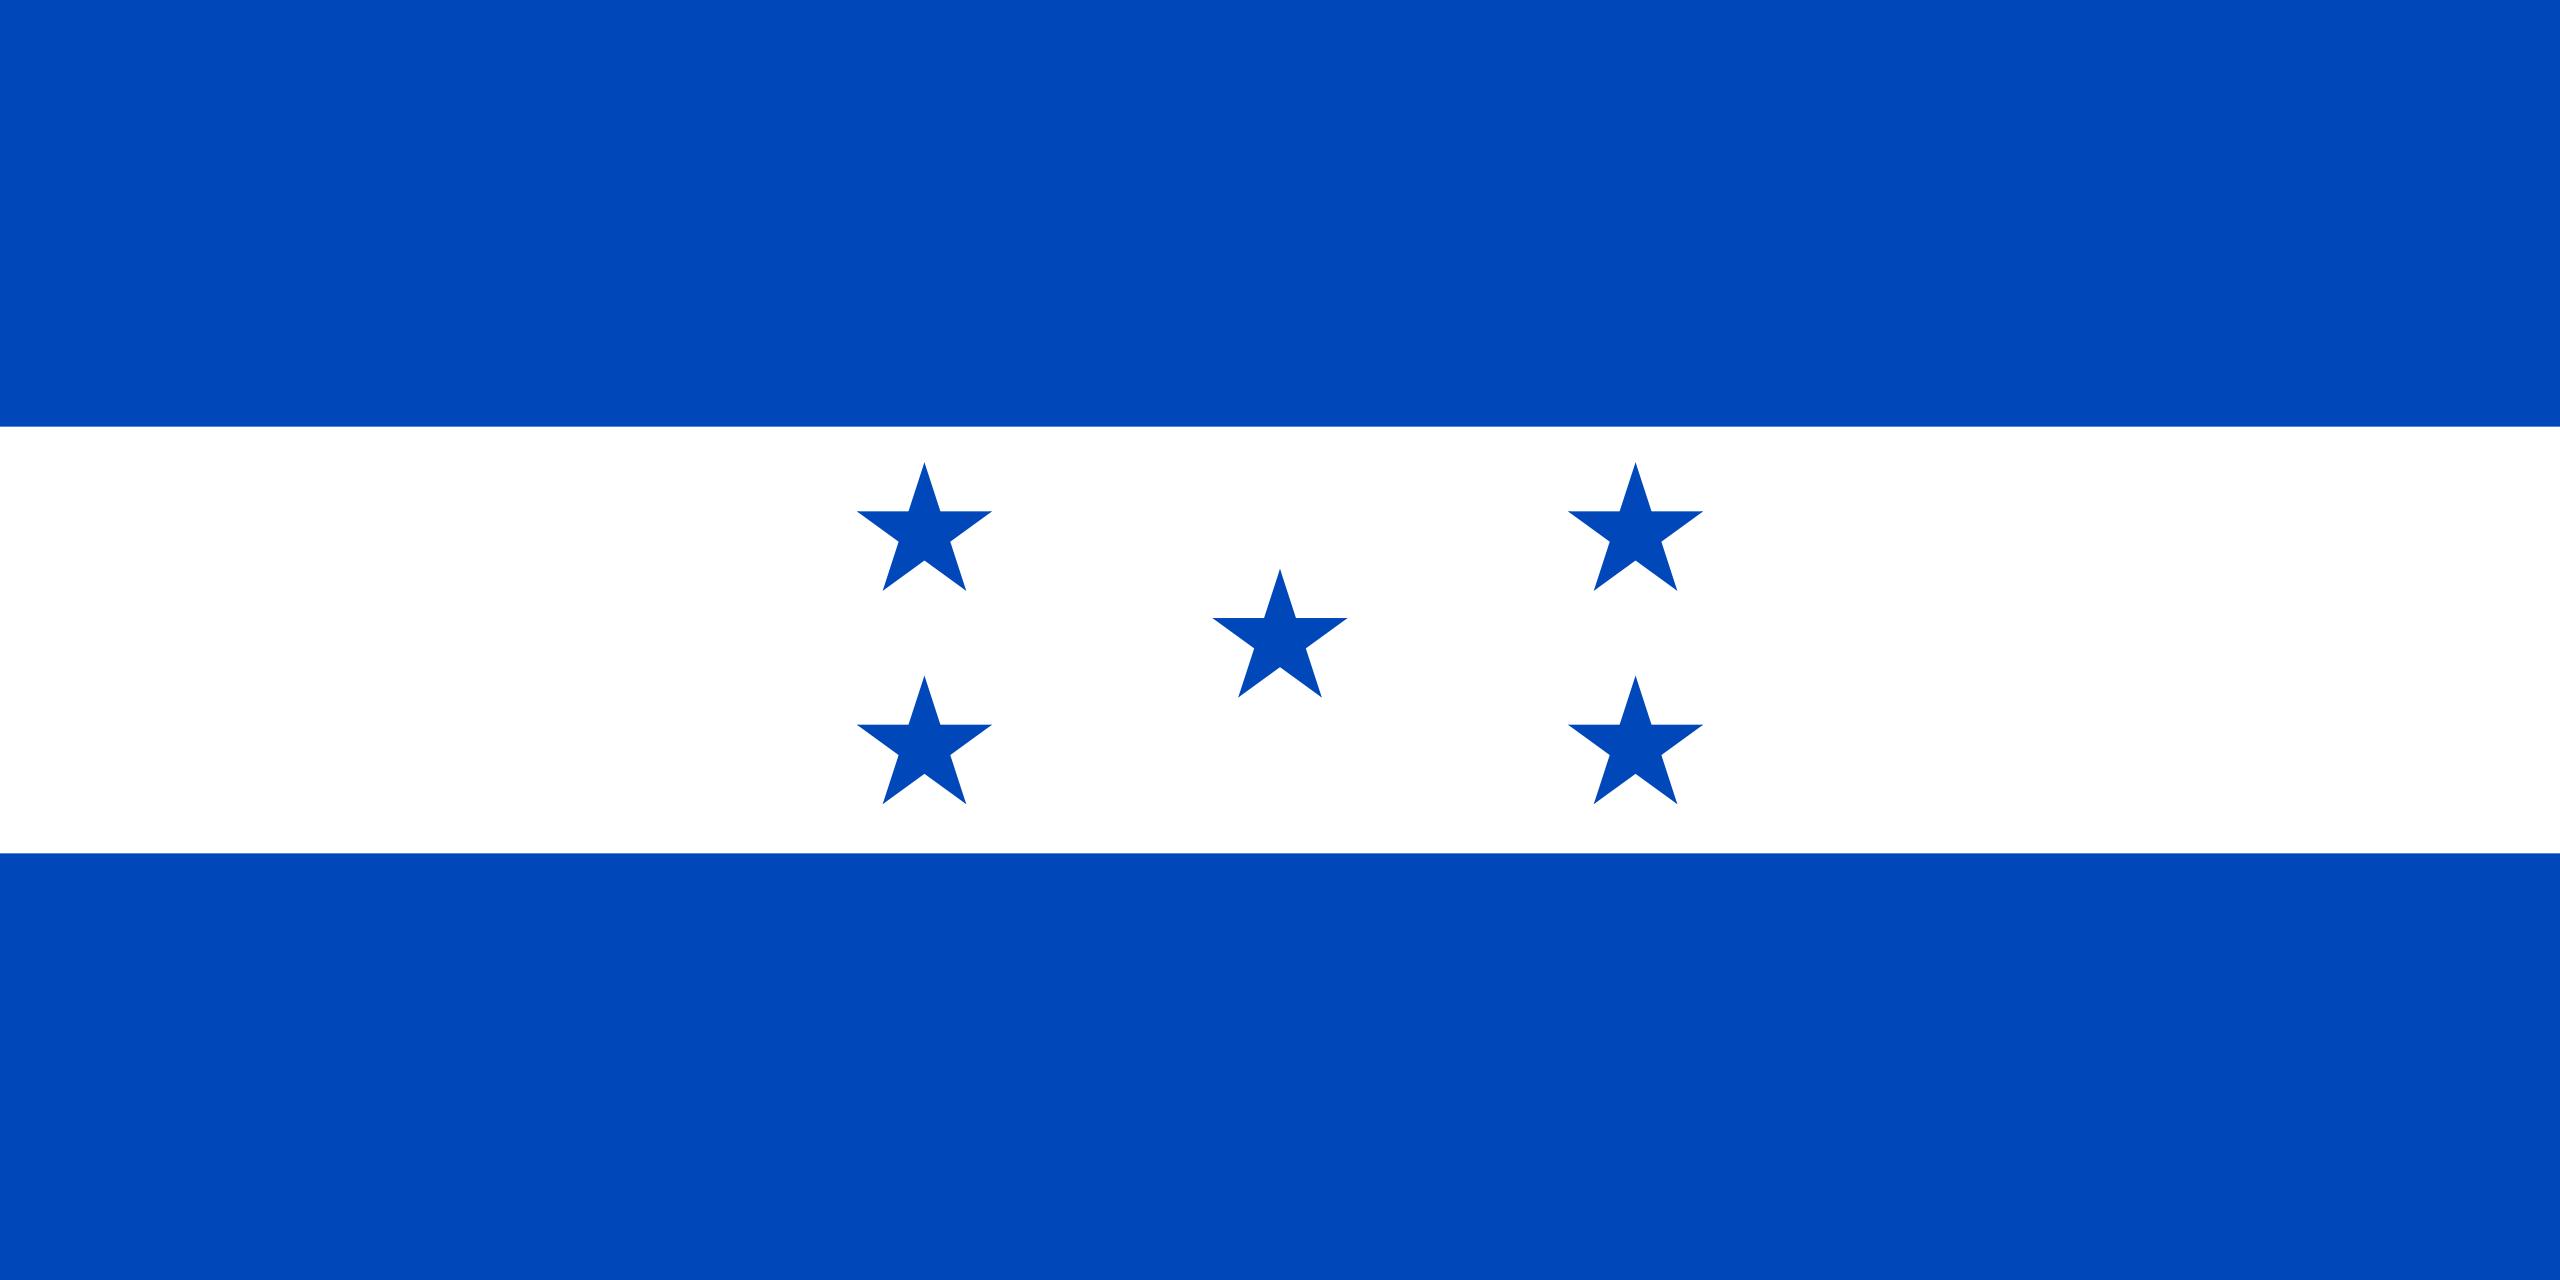 honduras, देश, emblema, लोग�प्रतीकbolo - HD वॉलपेपर - प्रोफेसर-falken.com